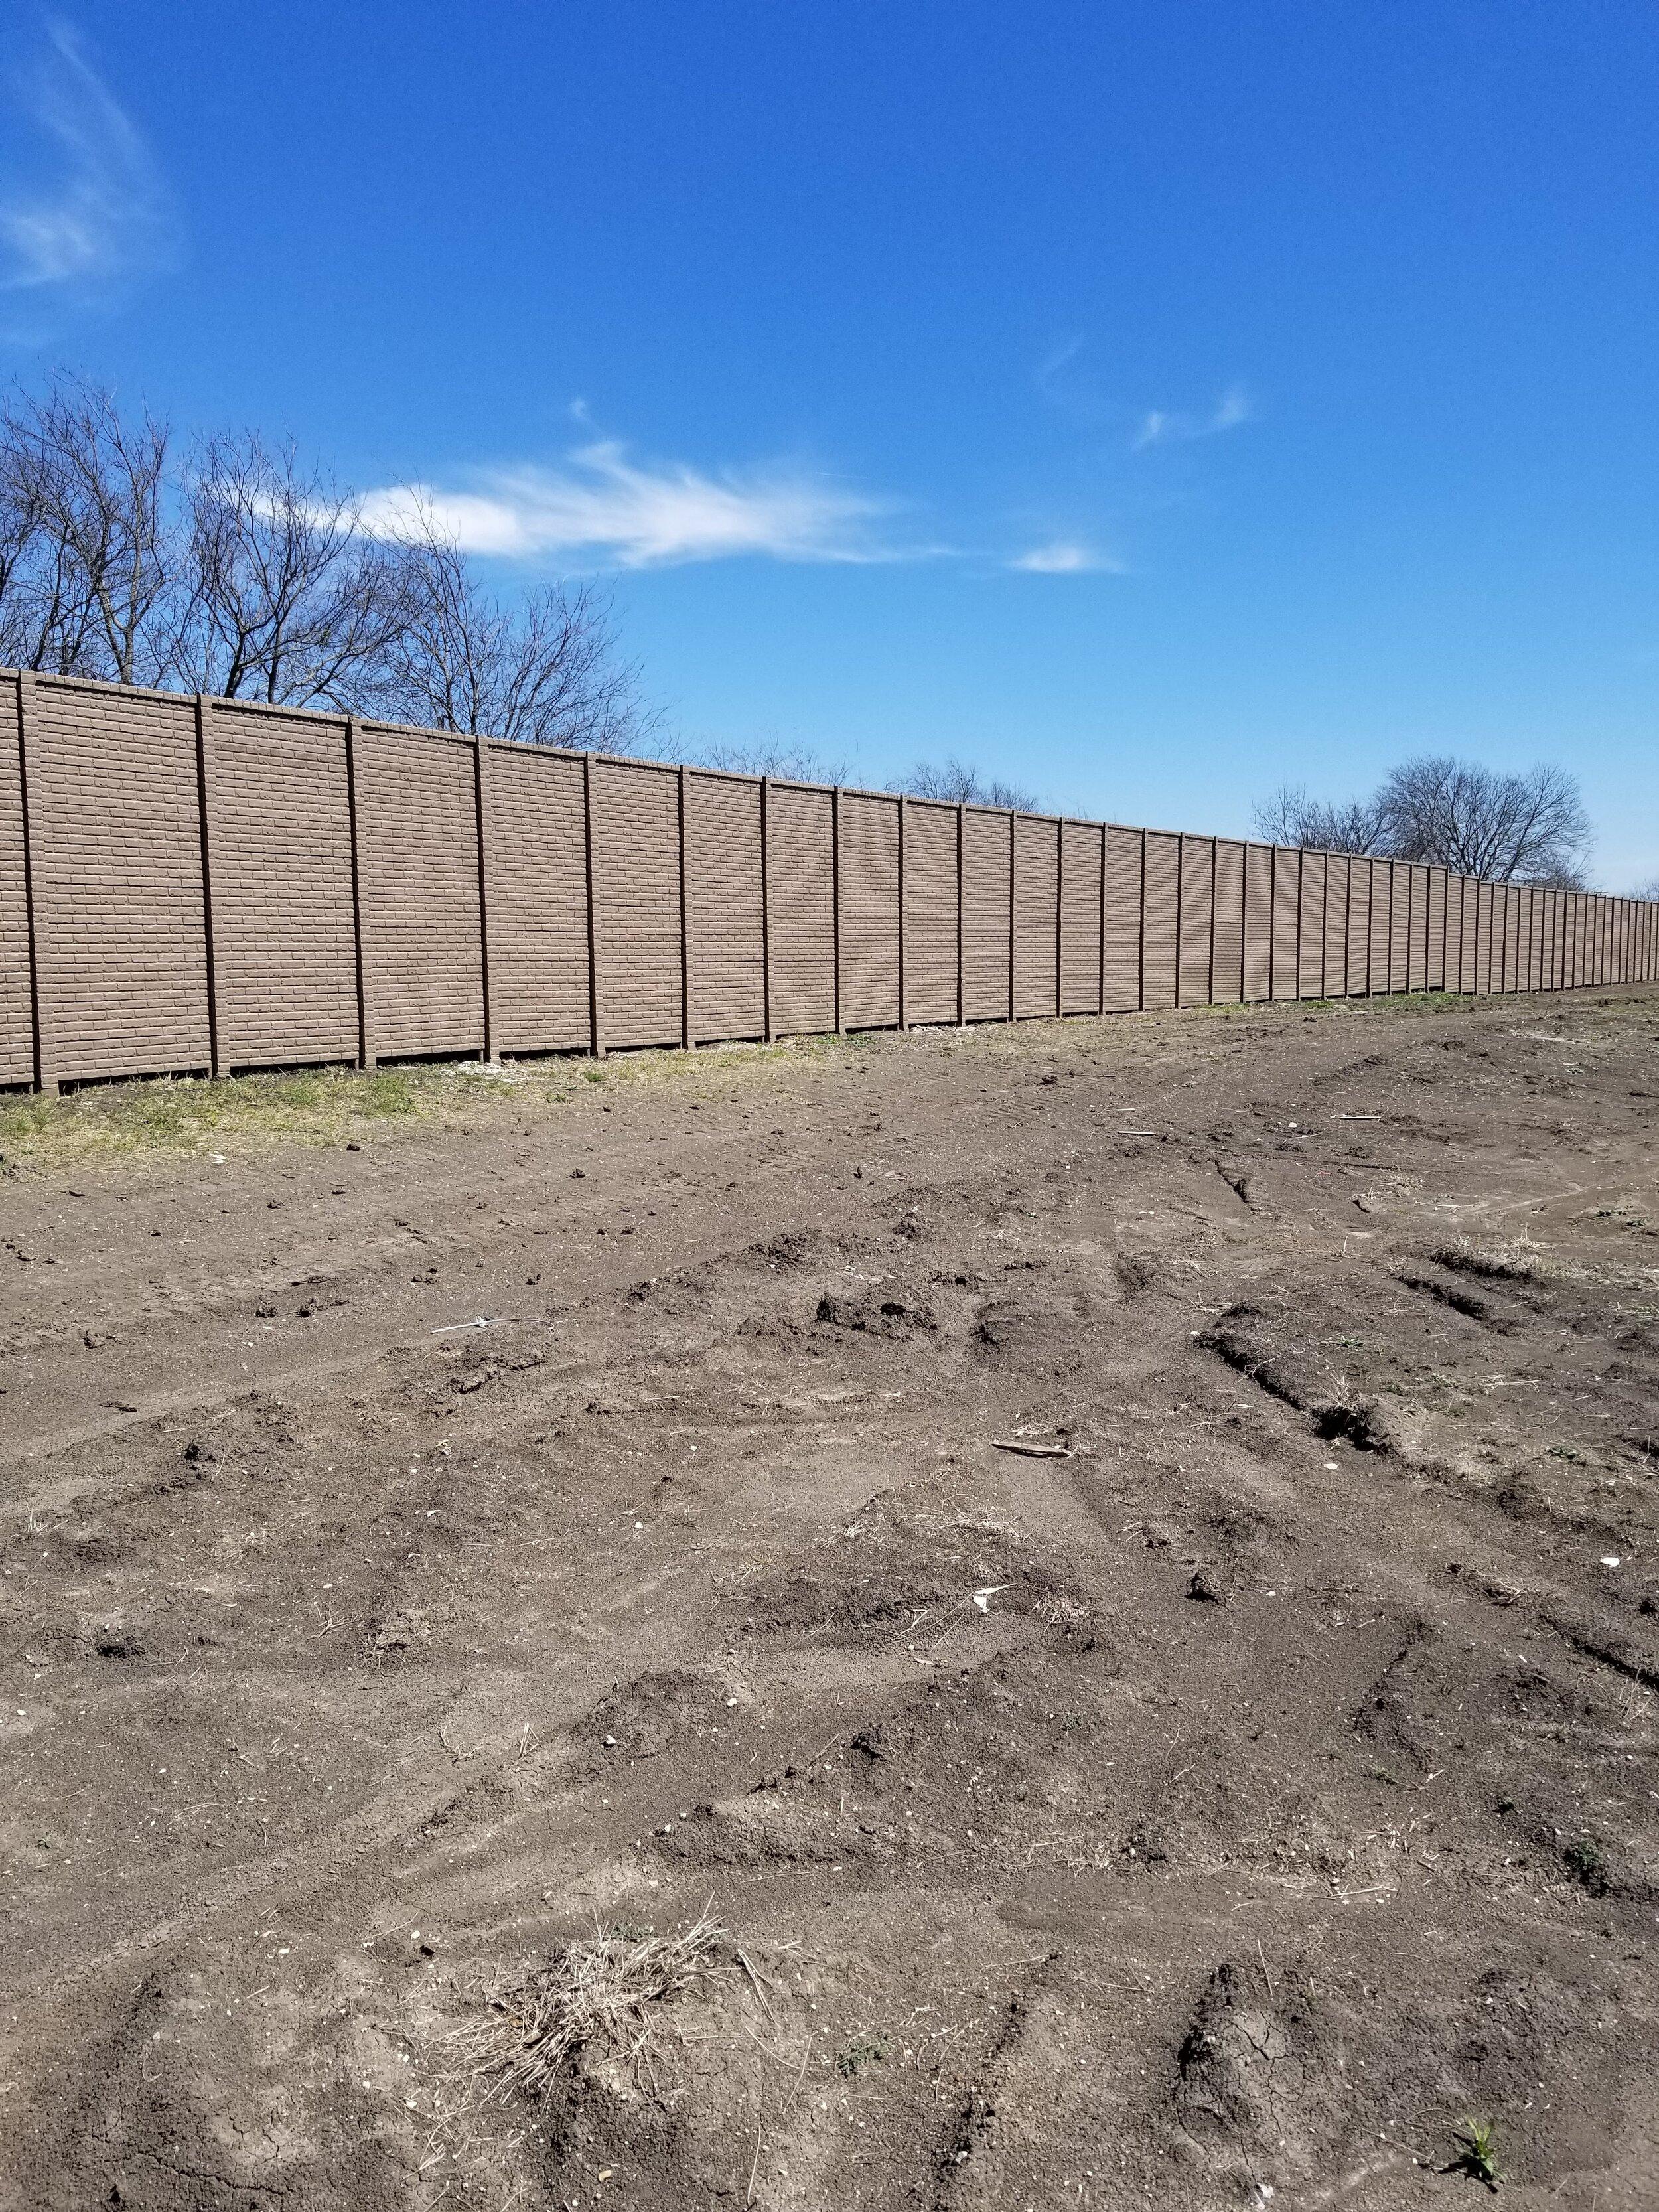 OldBrick Precast Fence - Fort Worth, TX 1 (2).jpg